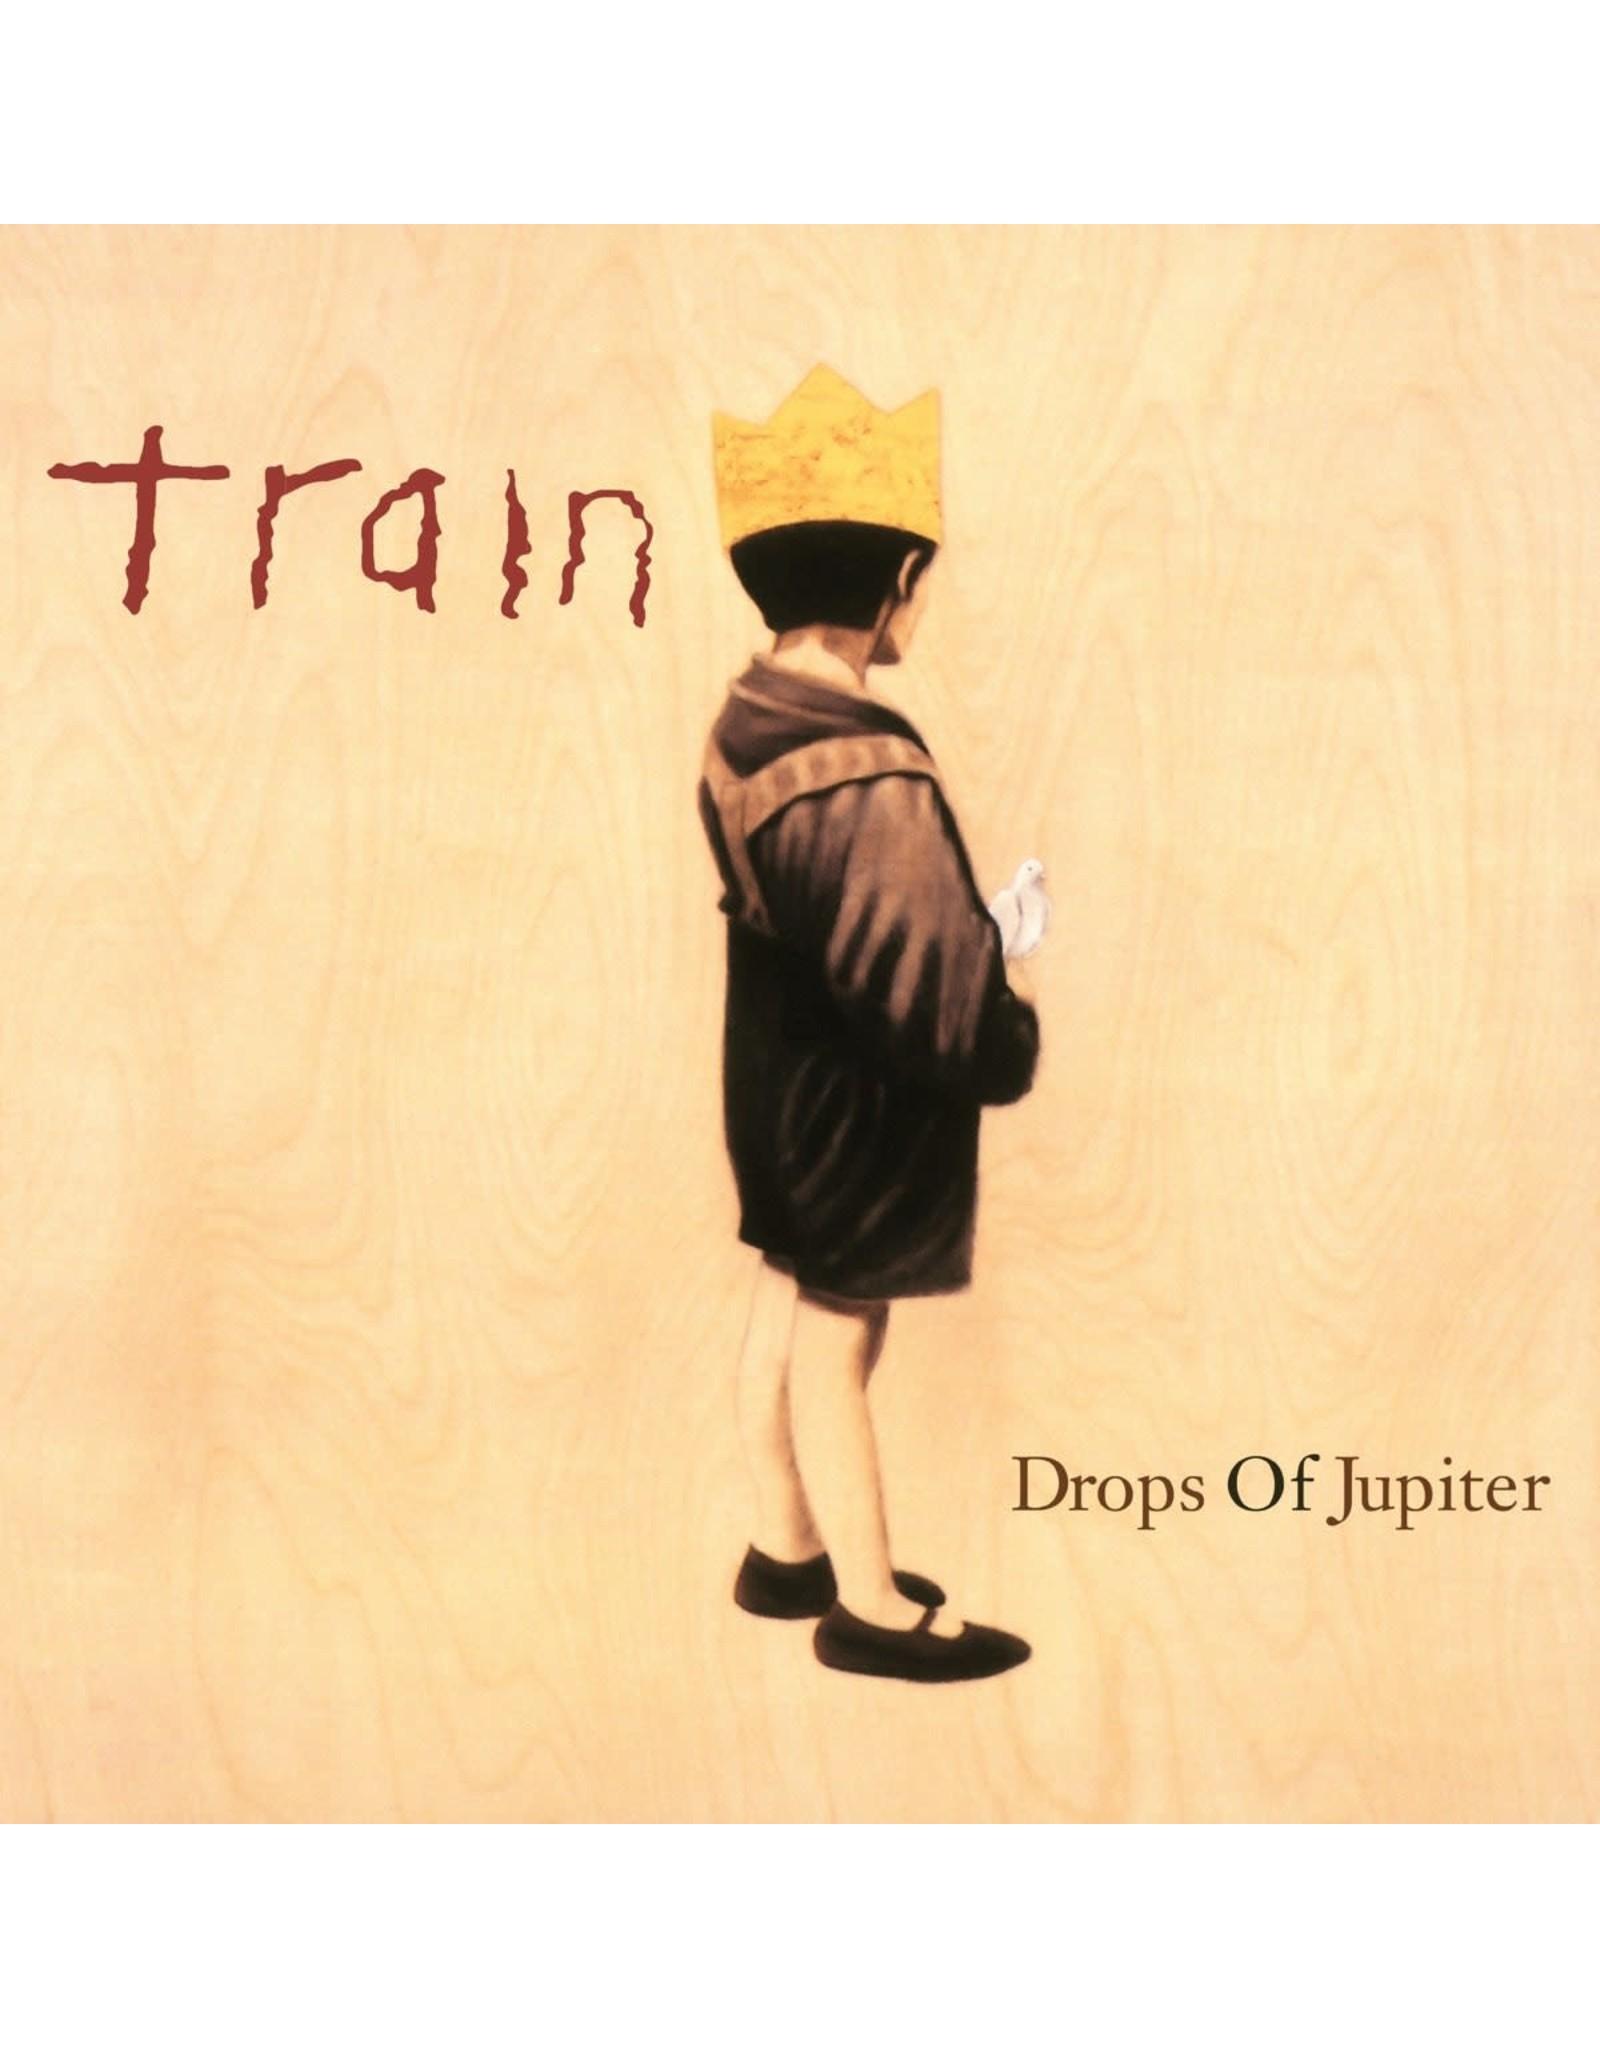 Train - Drops of Jupiter (20th Anniversary) [Bronze Vinyl]